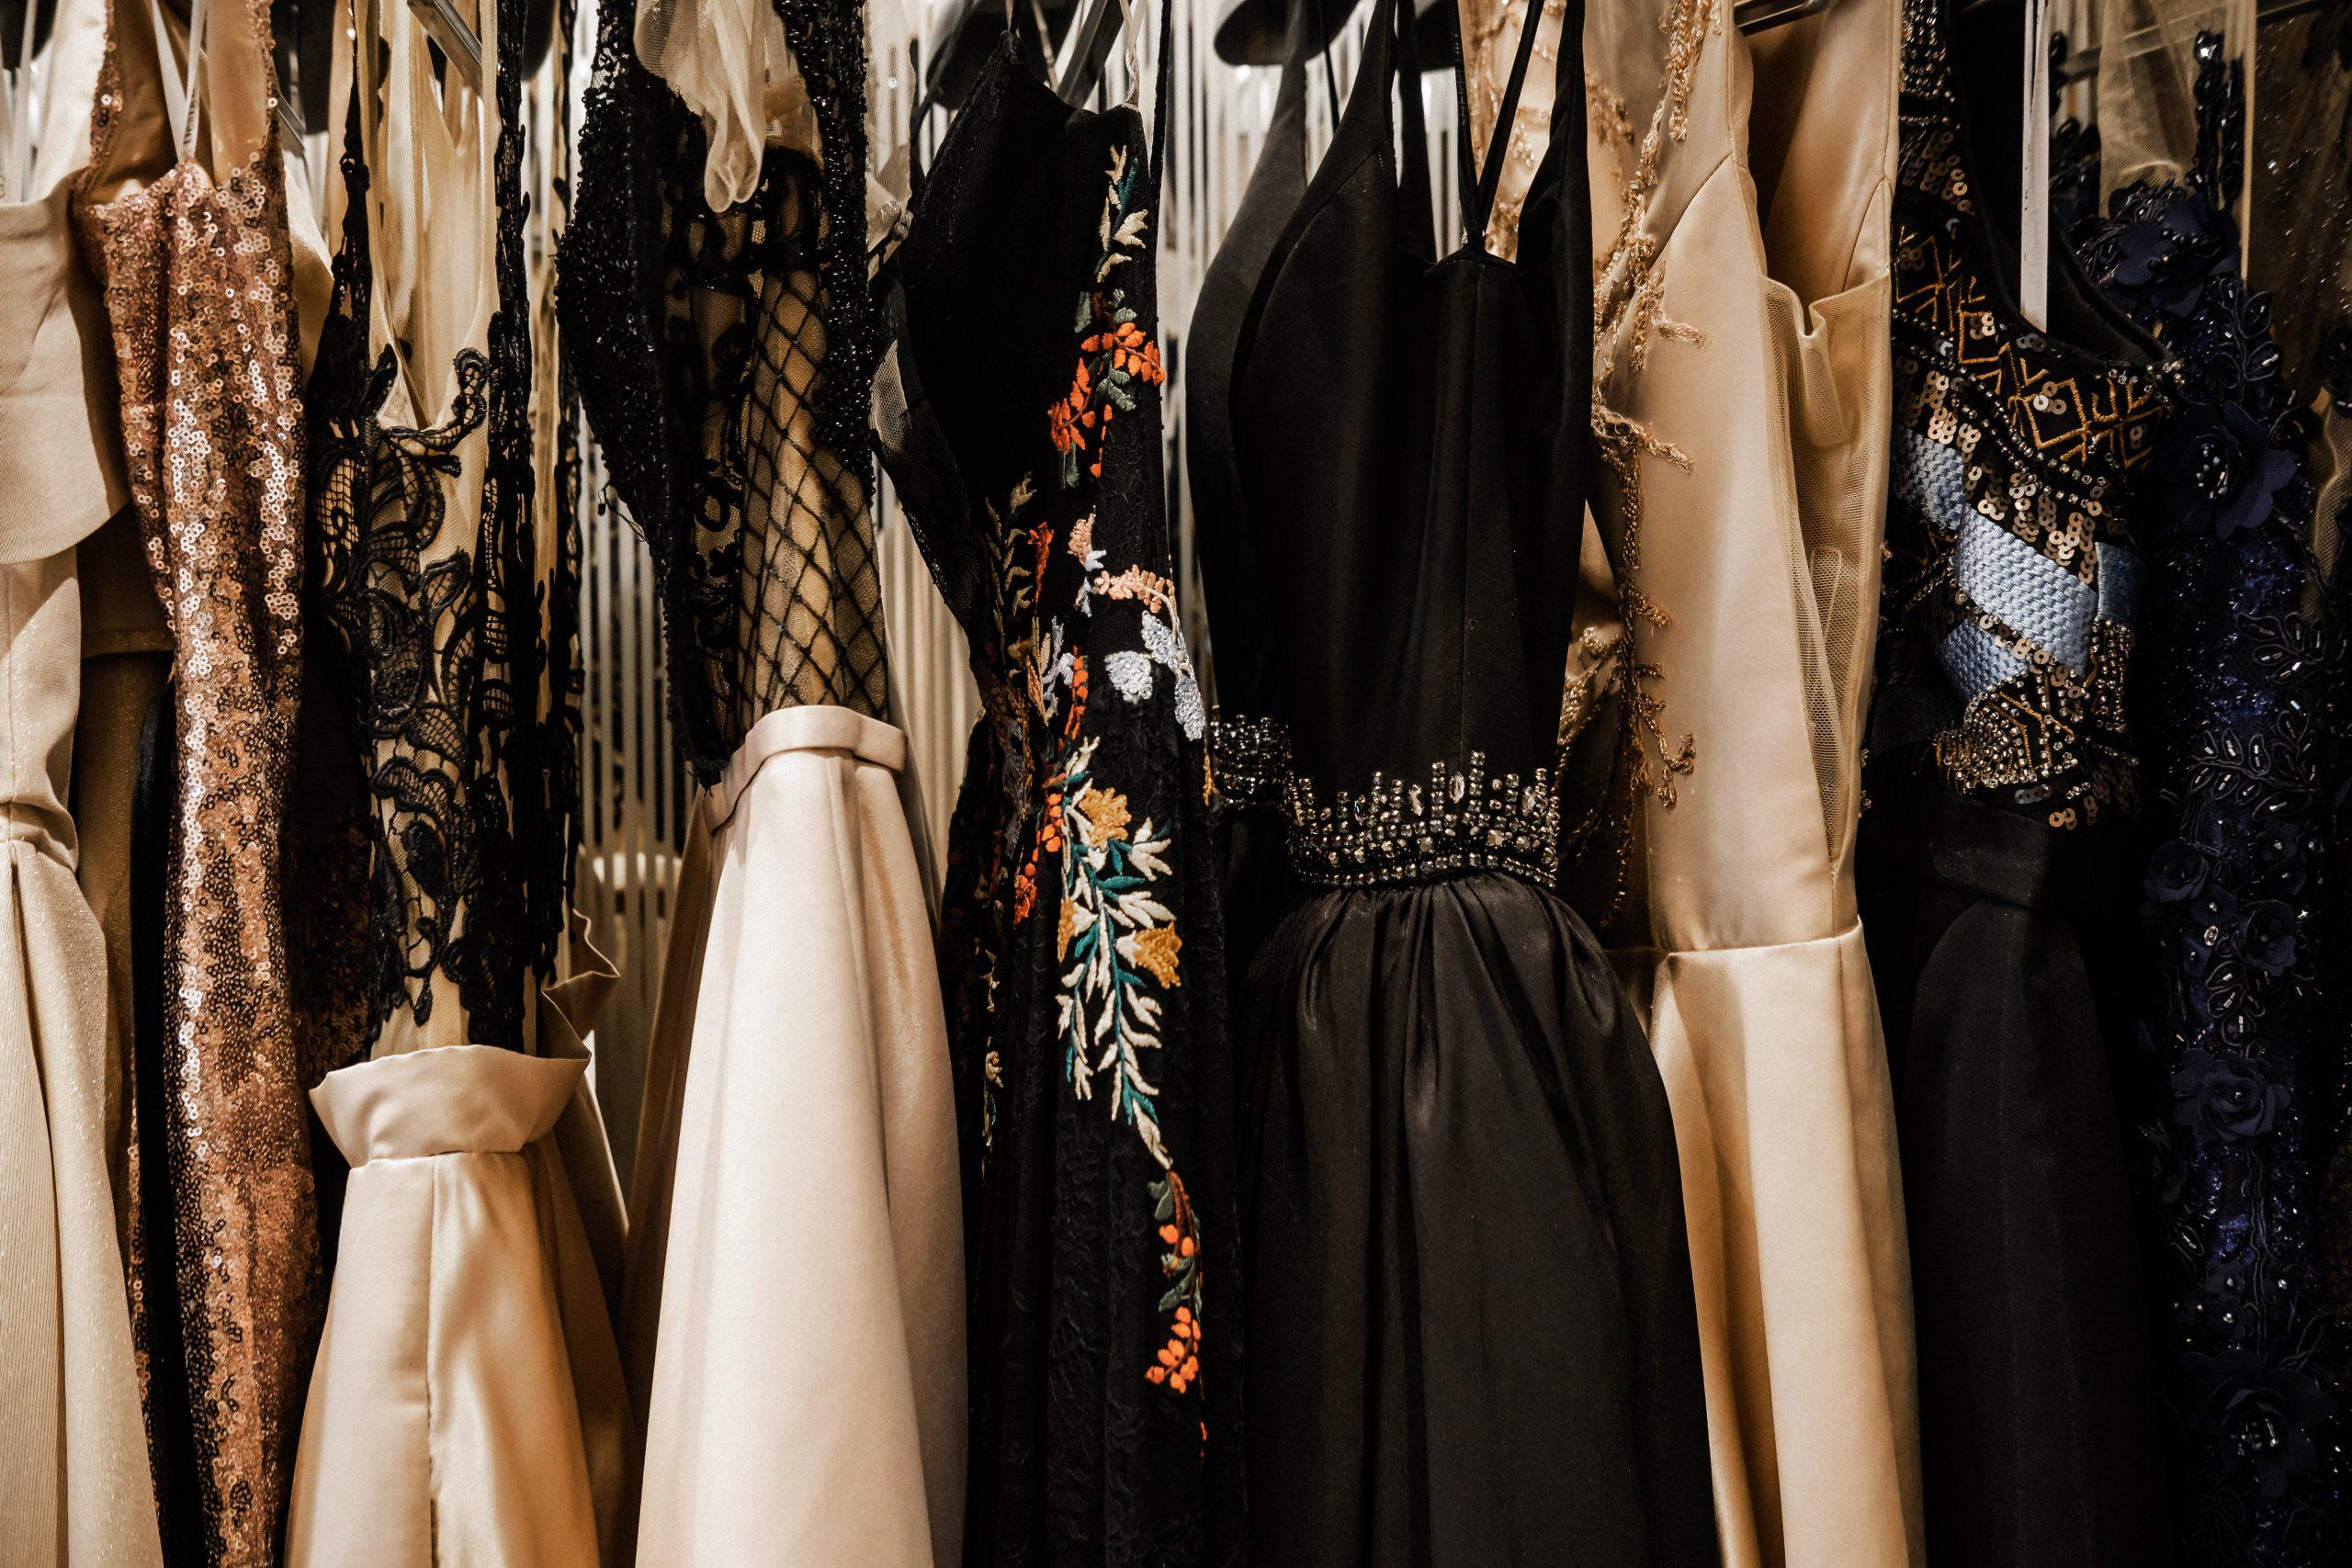 Co ubrać do koronkowej sukienki?